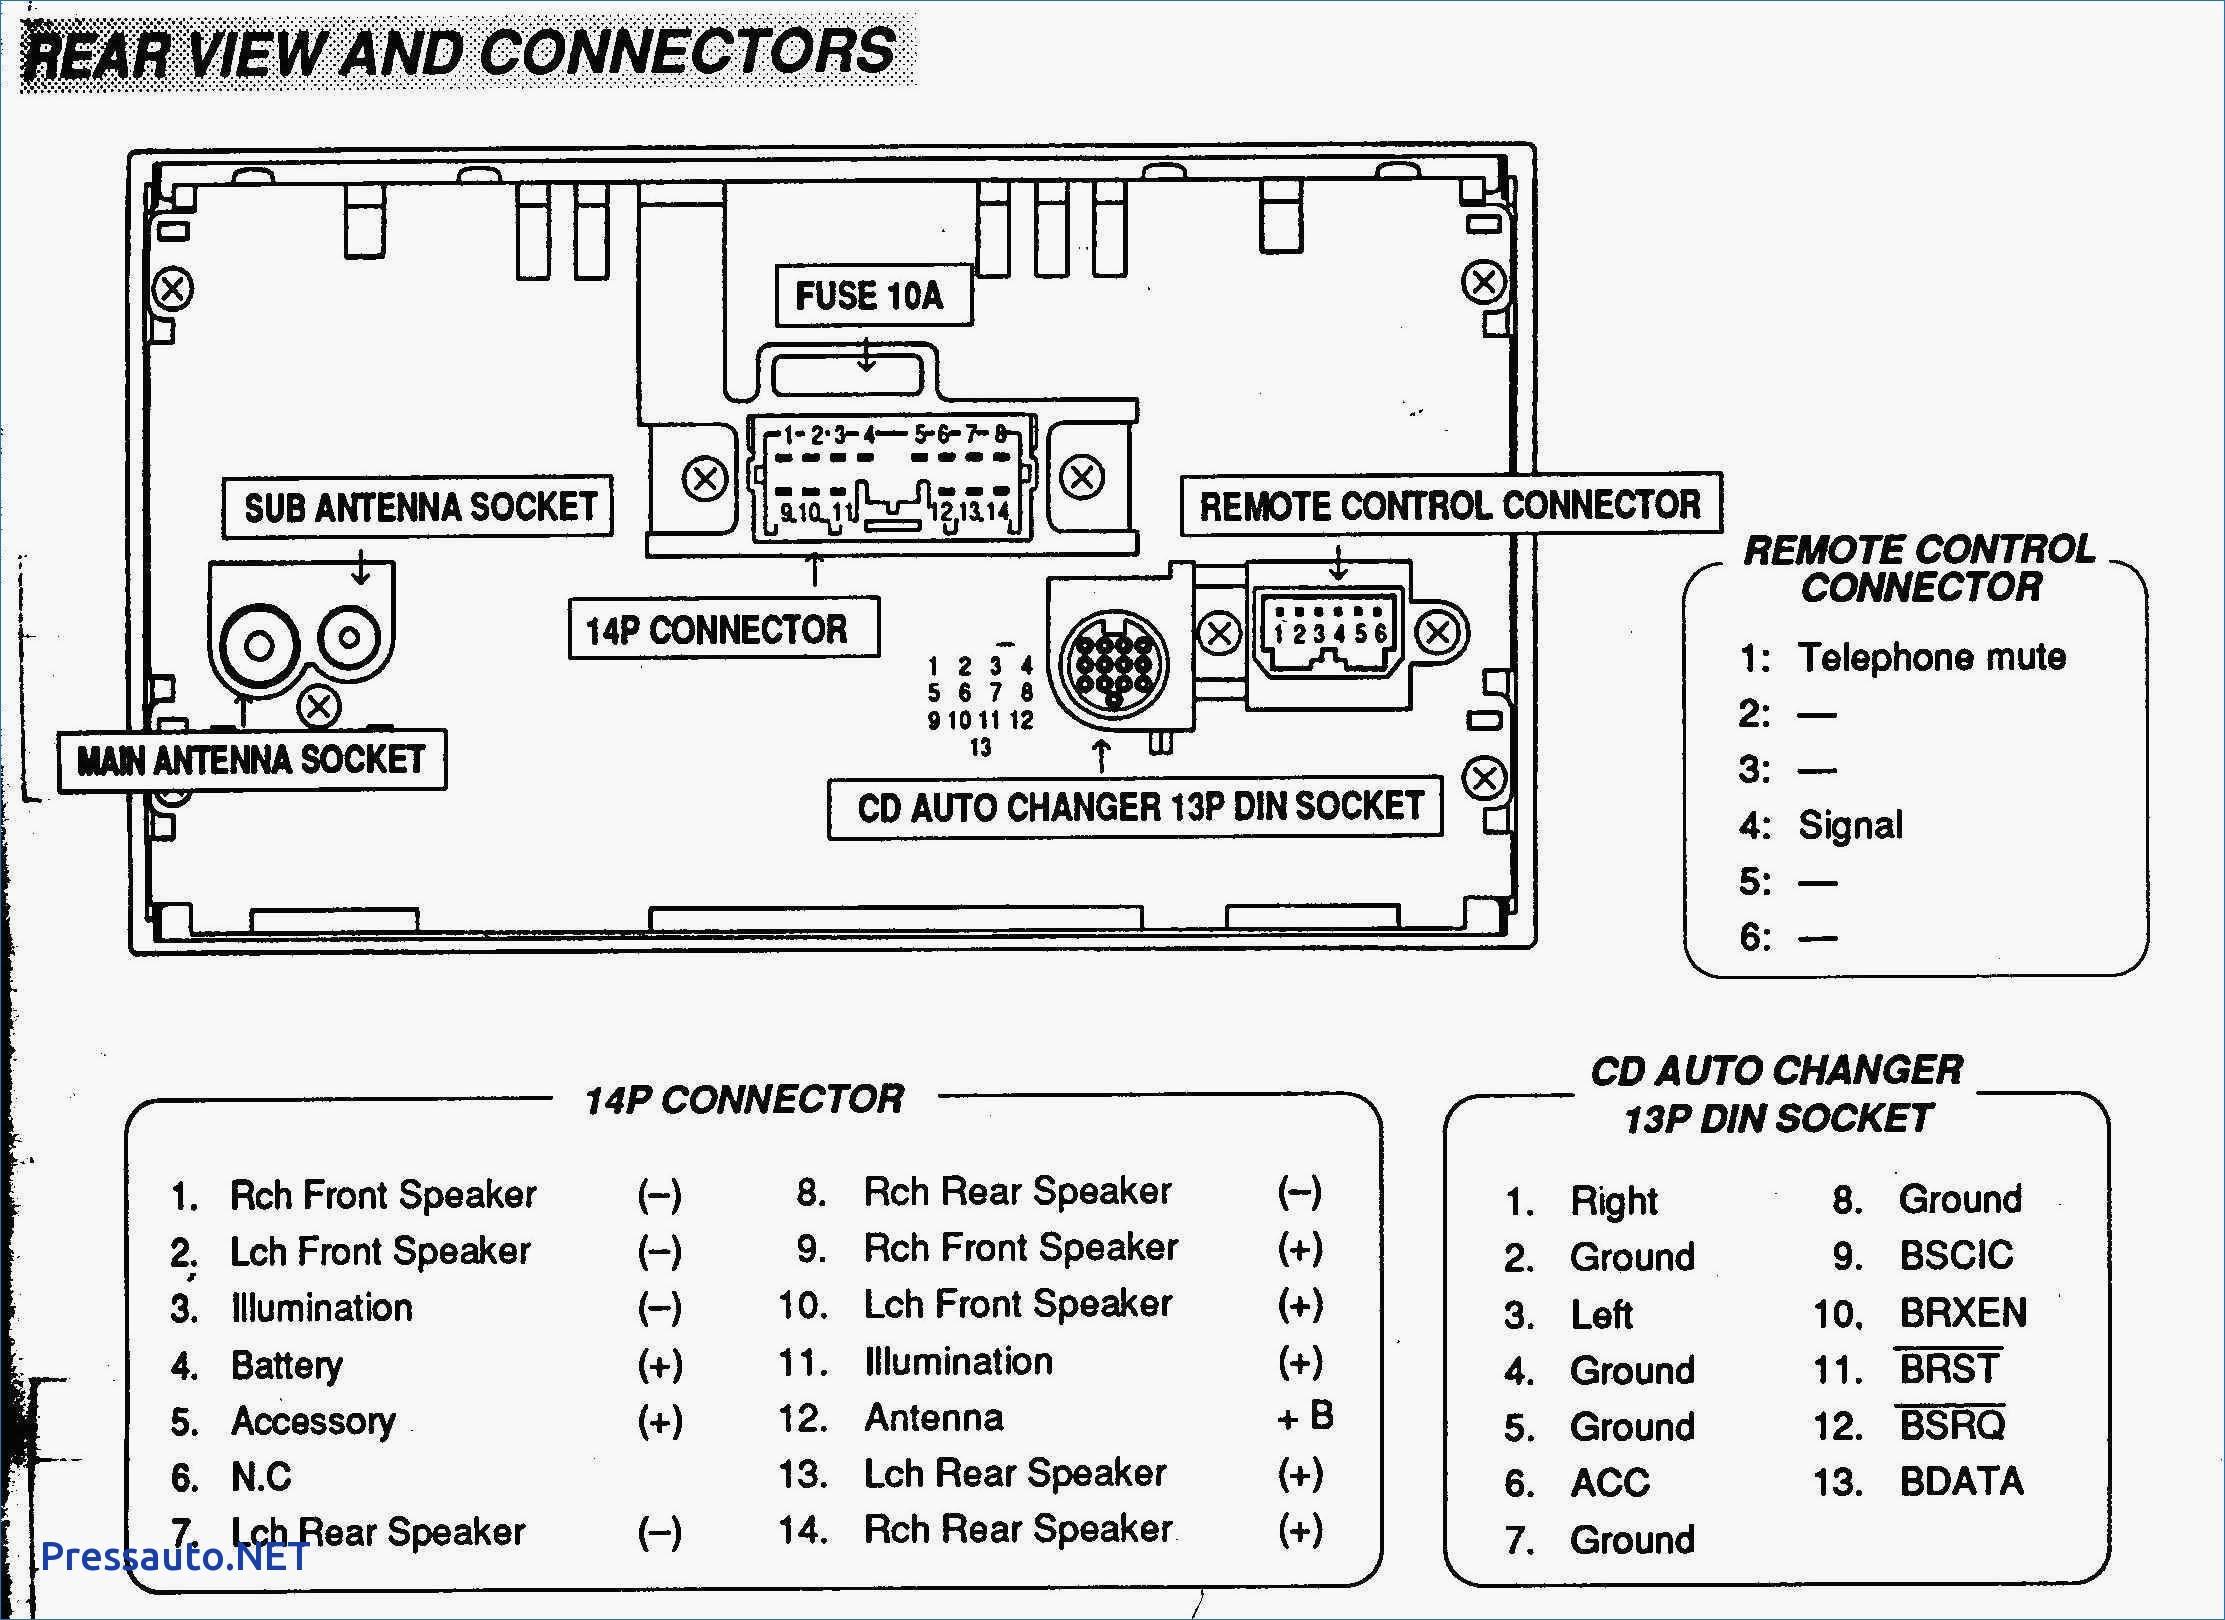 Boss Bv9364b Wiring Diagram - Wiring Diagram Overview device-halt -  device-halt.aigaravenna.itaigaravenna.it